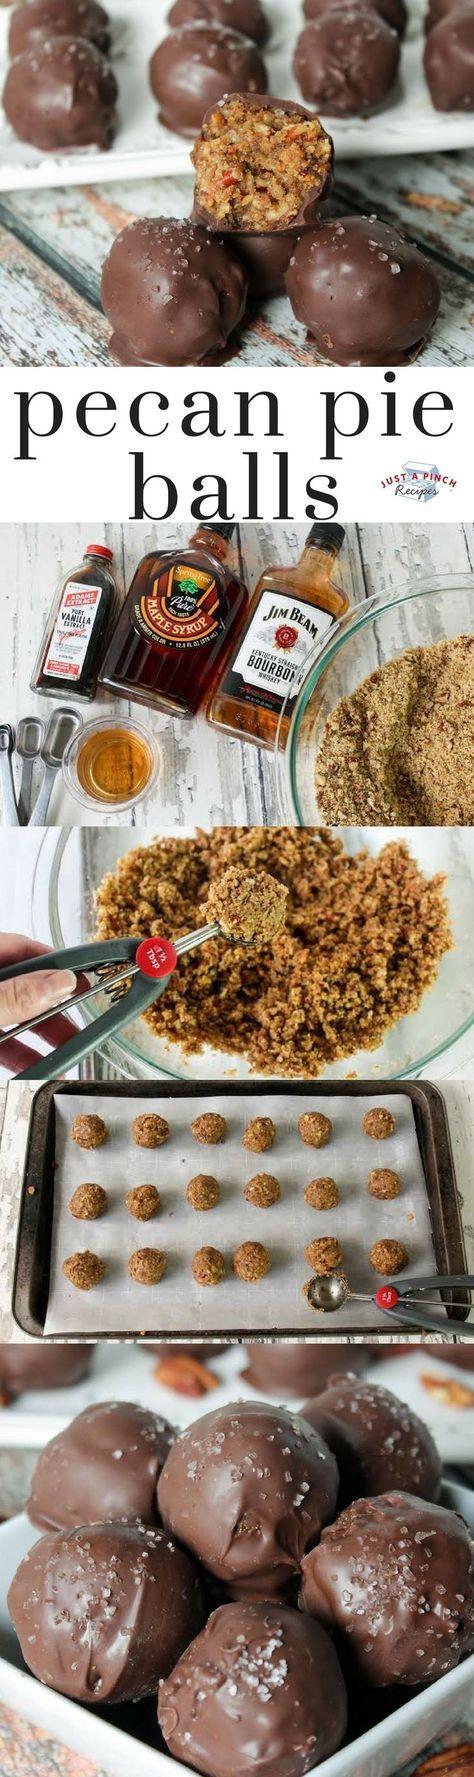 Thanksgiving Desserts 2019  Pecan Pie Balls Receta en 2019 Desserts